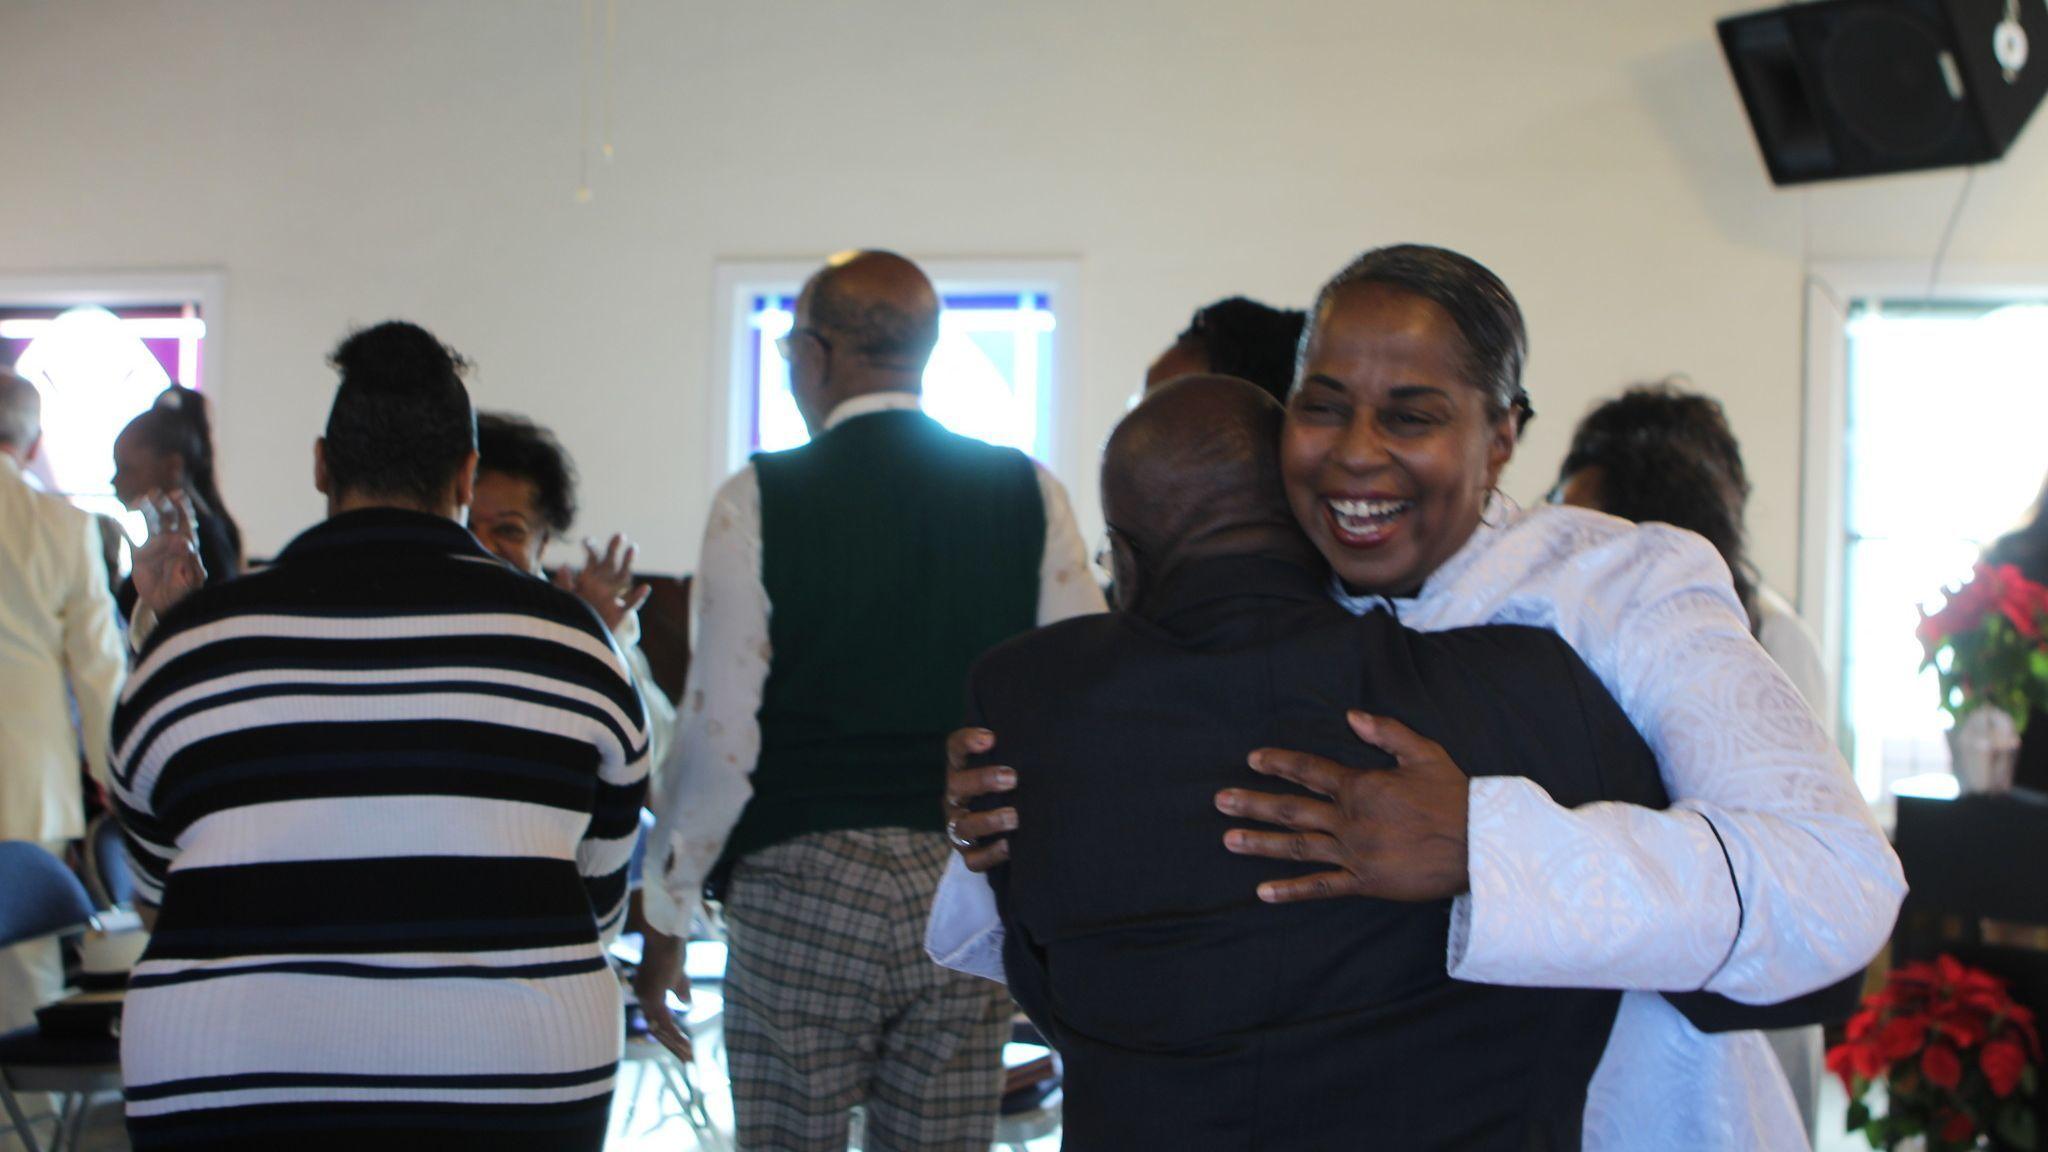 Rev. Denise Jackson greets congregants of Prince Chapel following her sermon on Sunday morning, Dec. 2.